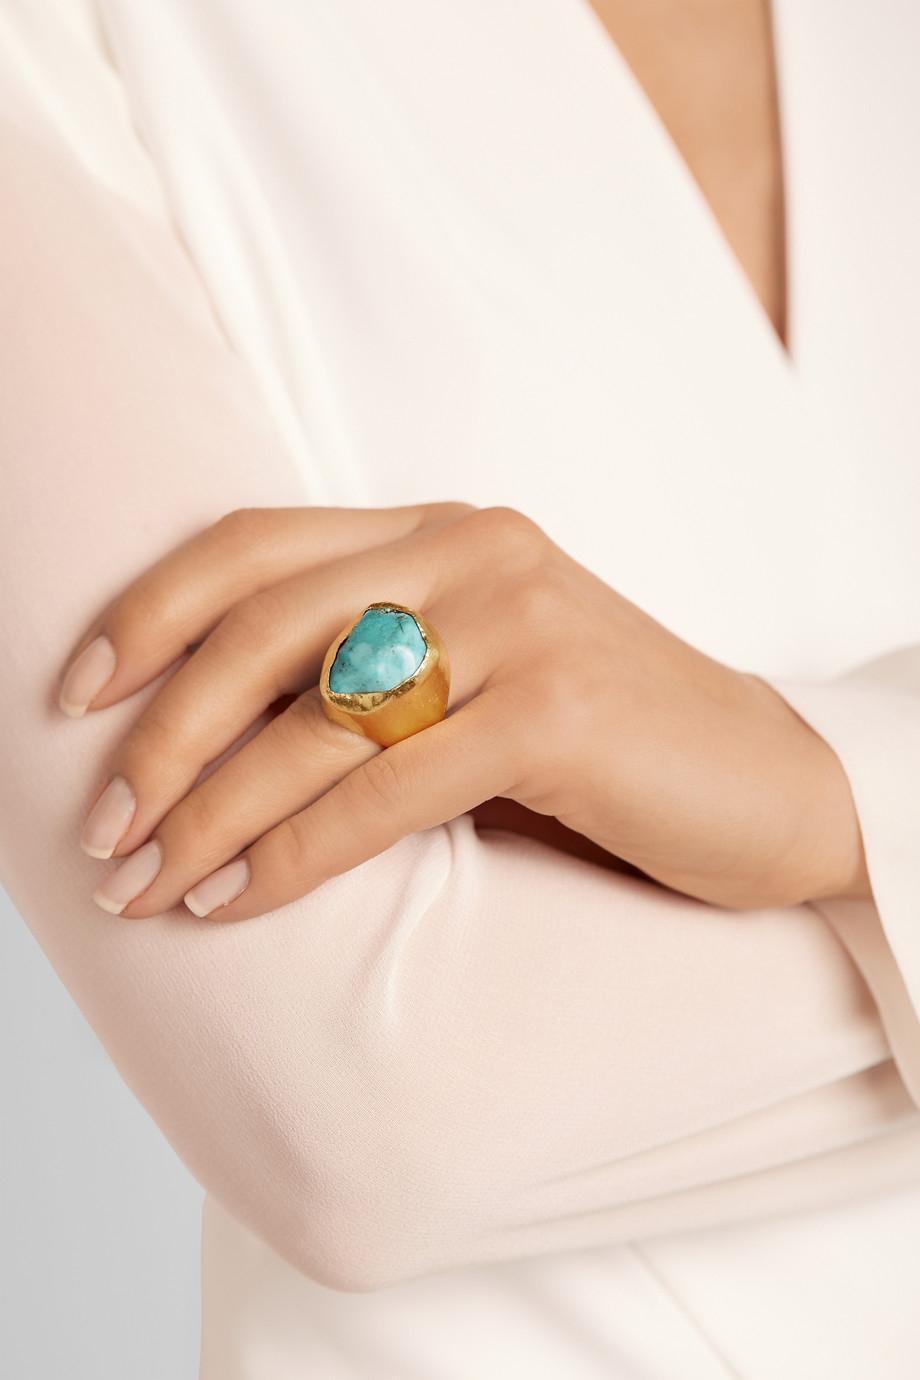 Pippa Small 18-karat Gold Turquoise Ring xTZnuDDiVg